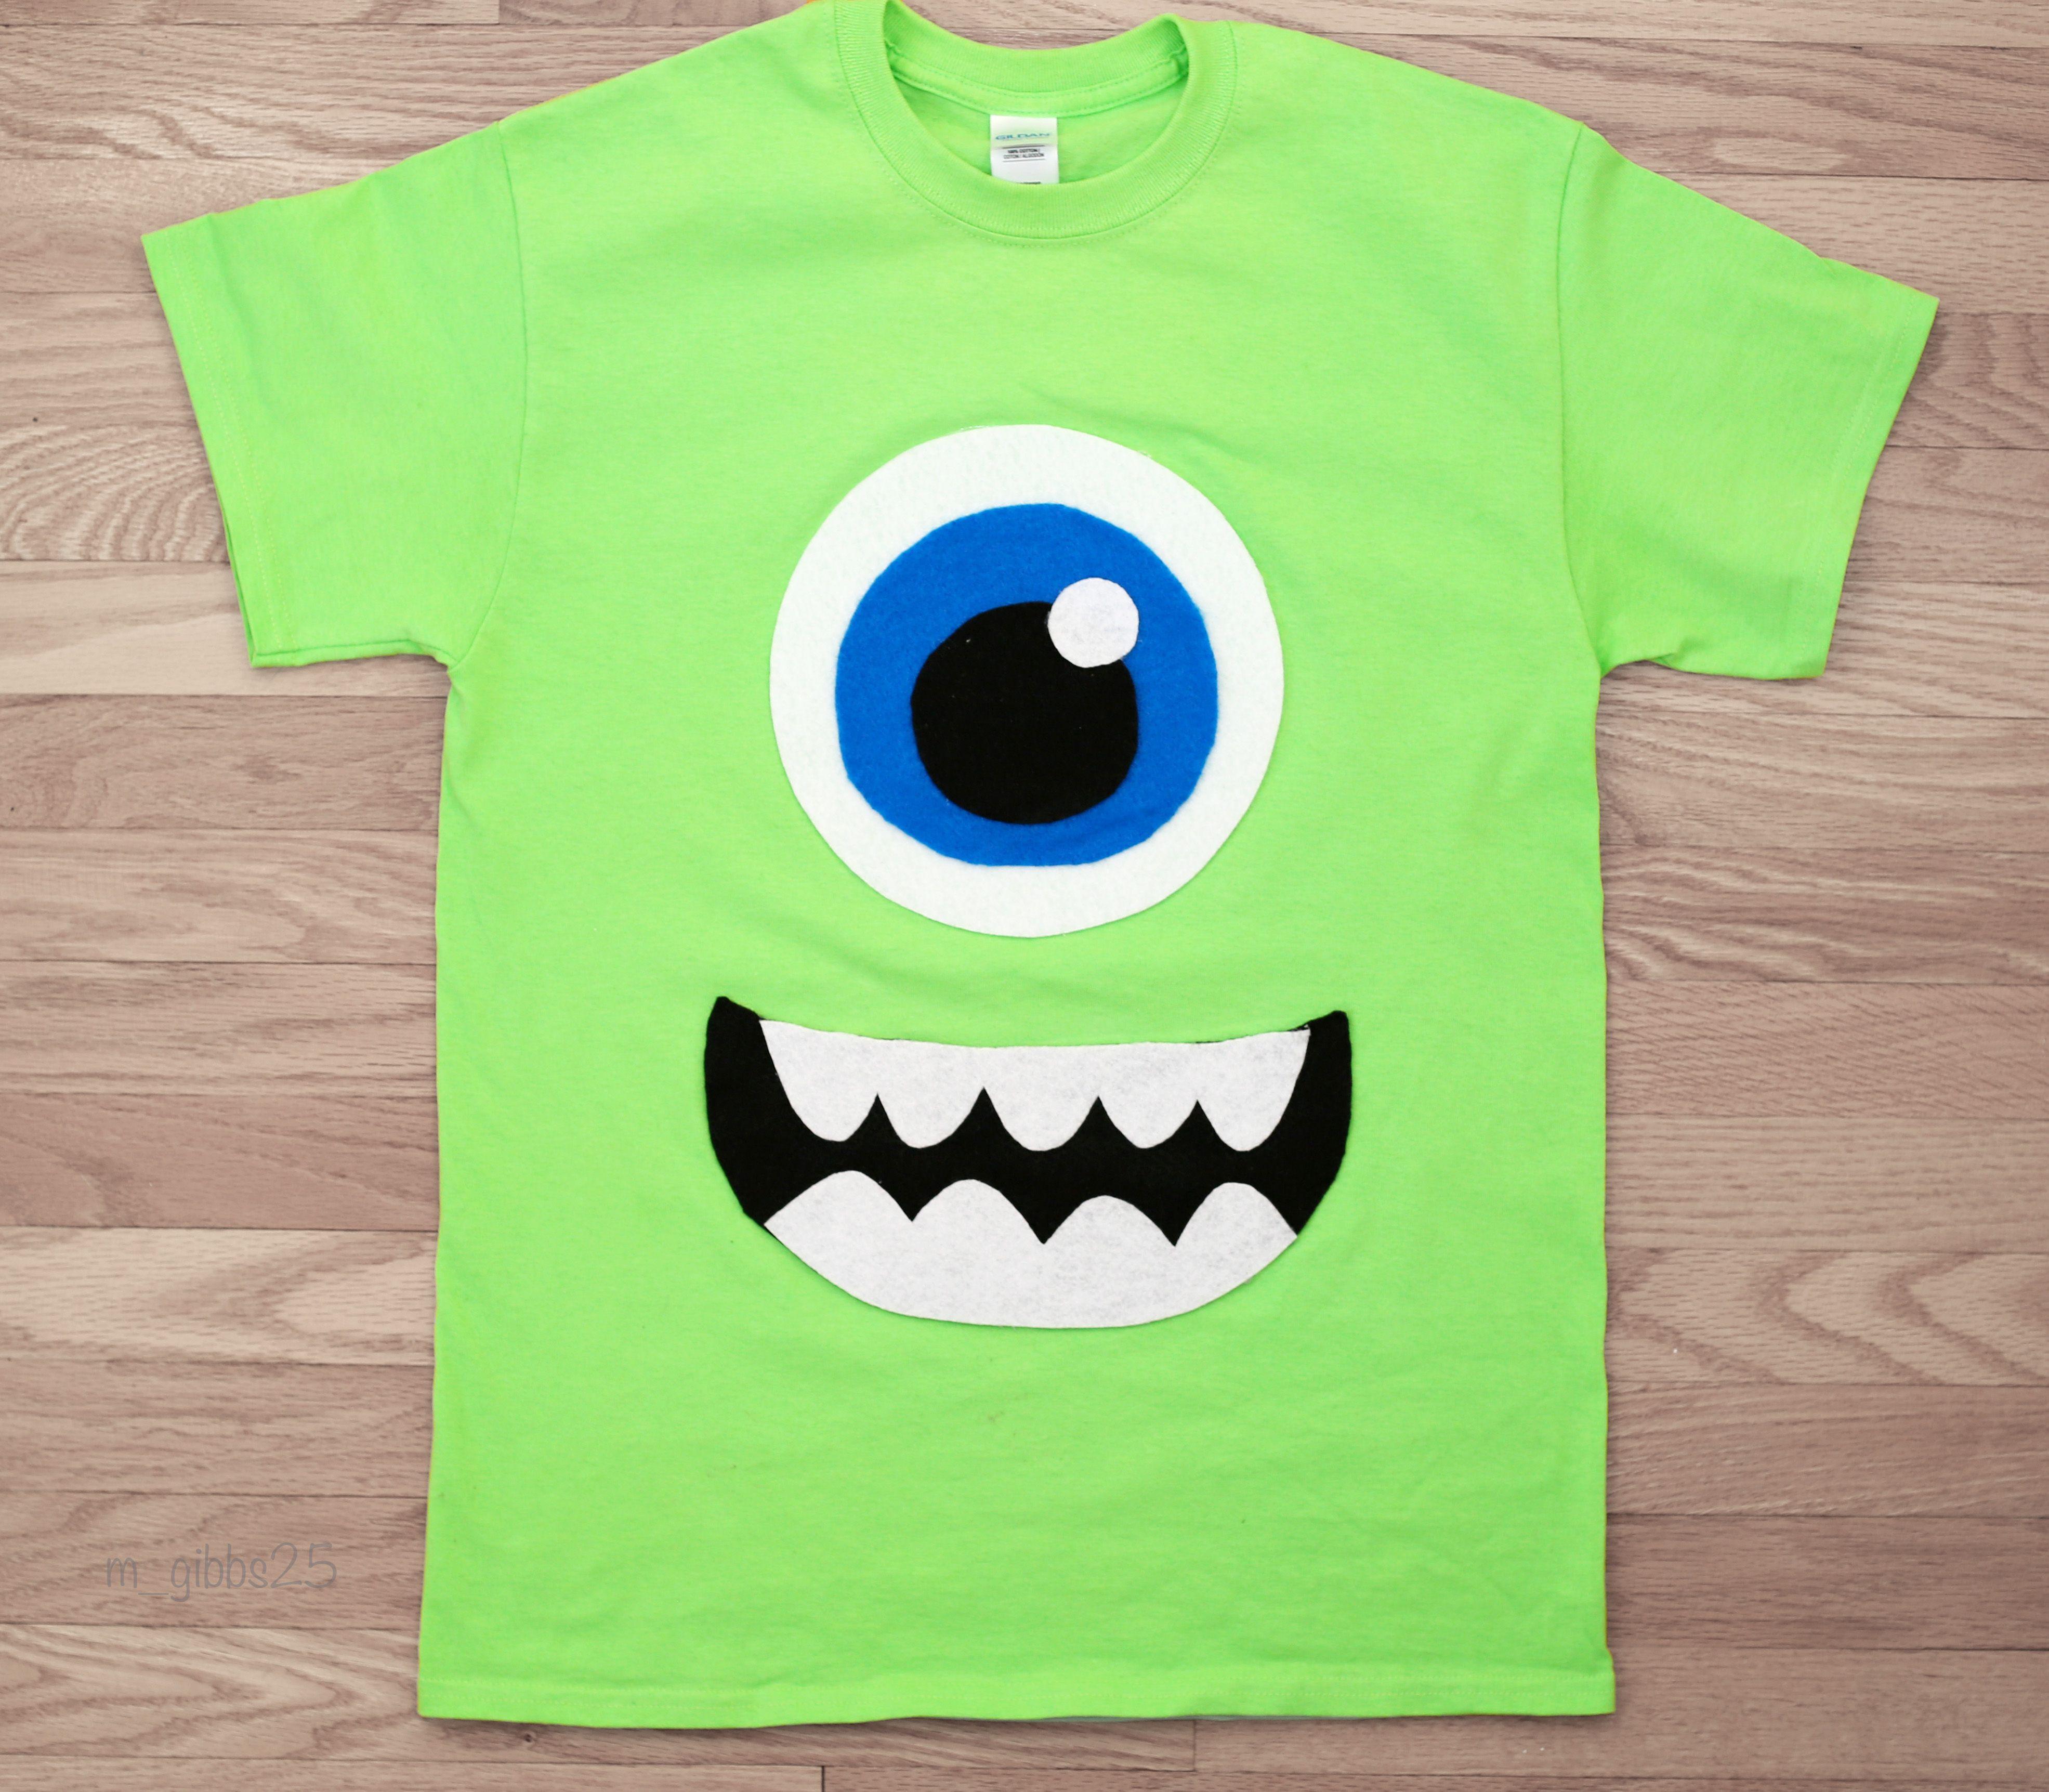 Mike Wazowski Diy Tshirt Monsters Inc Easy Halloween Costume Felt Hot Glue Monster Inc Costumes Monster Shirts Monsters Inc Costume Diy